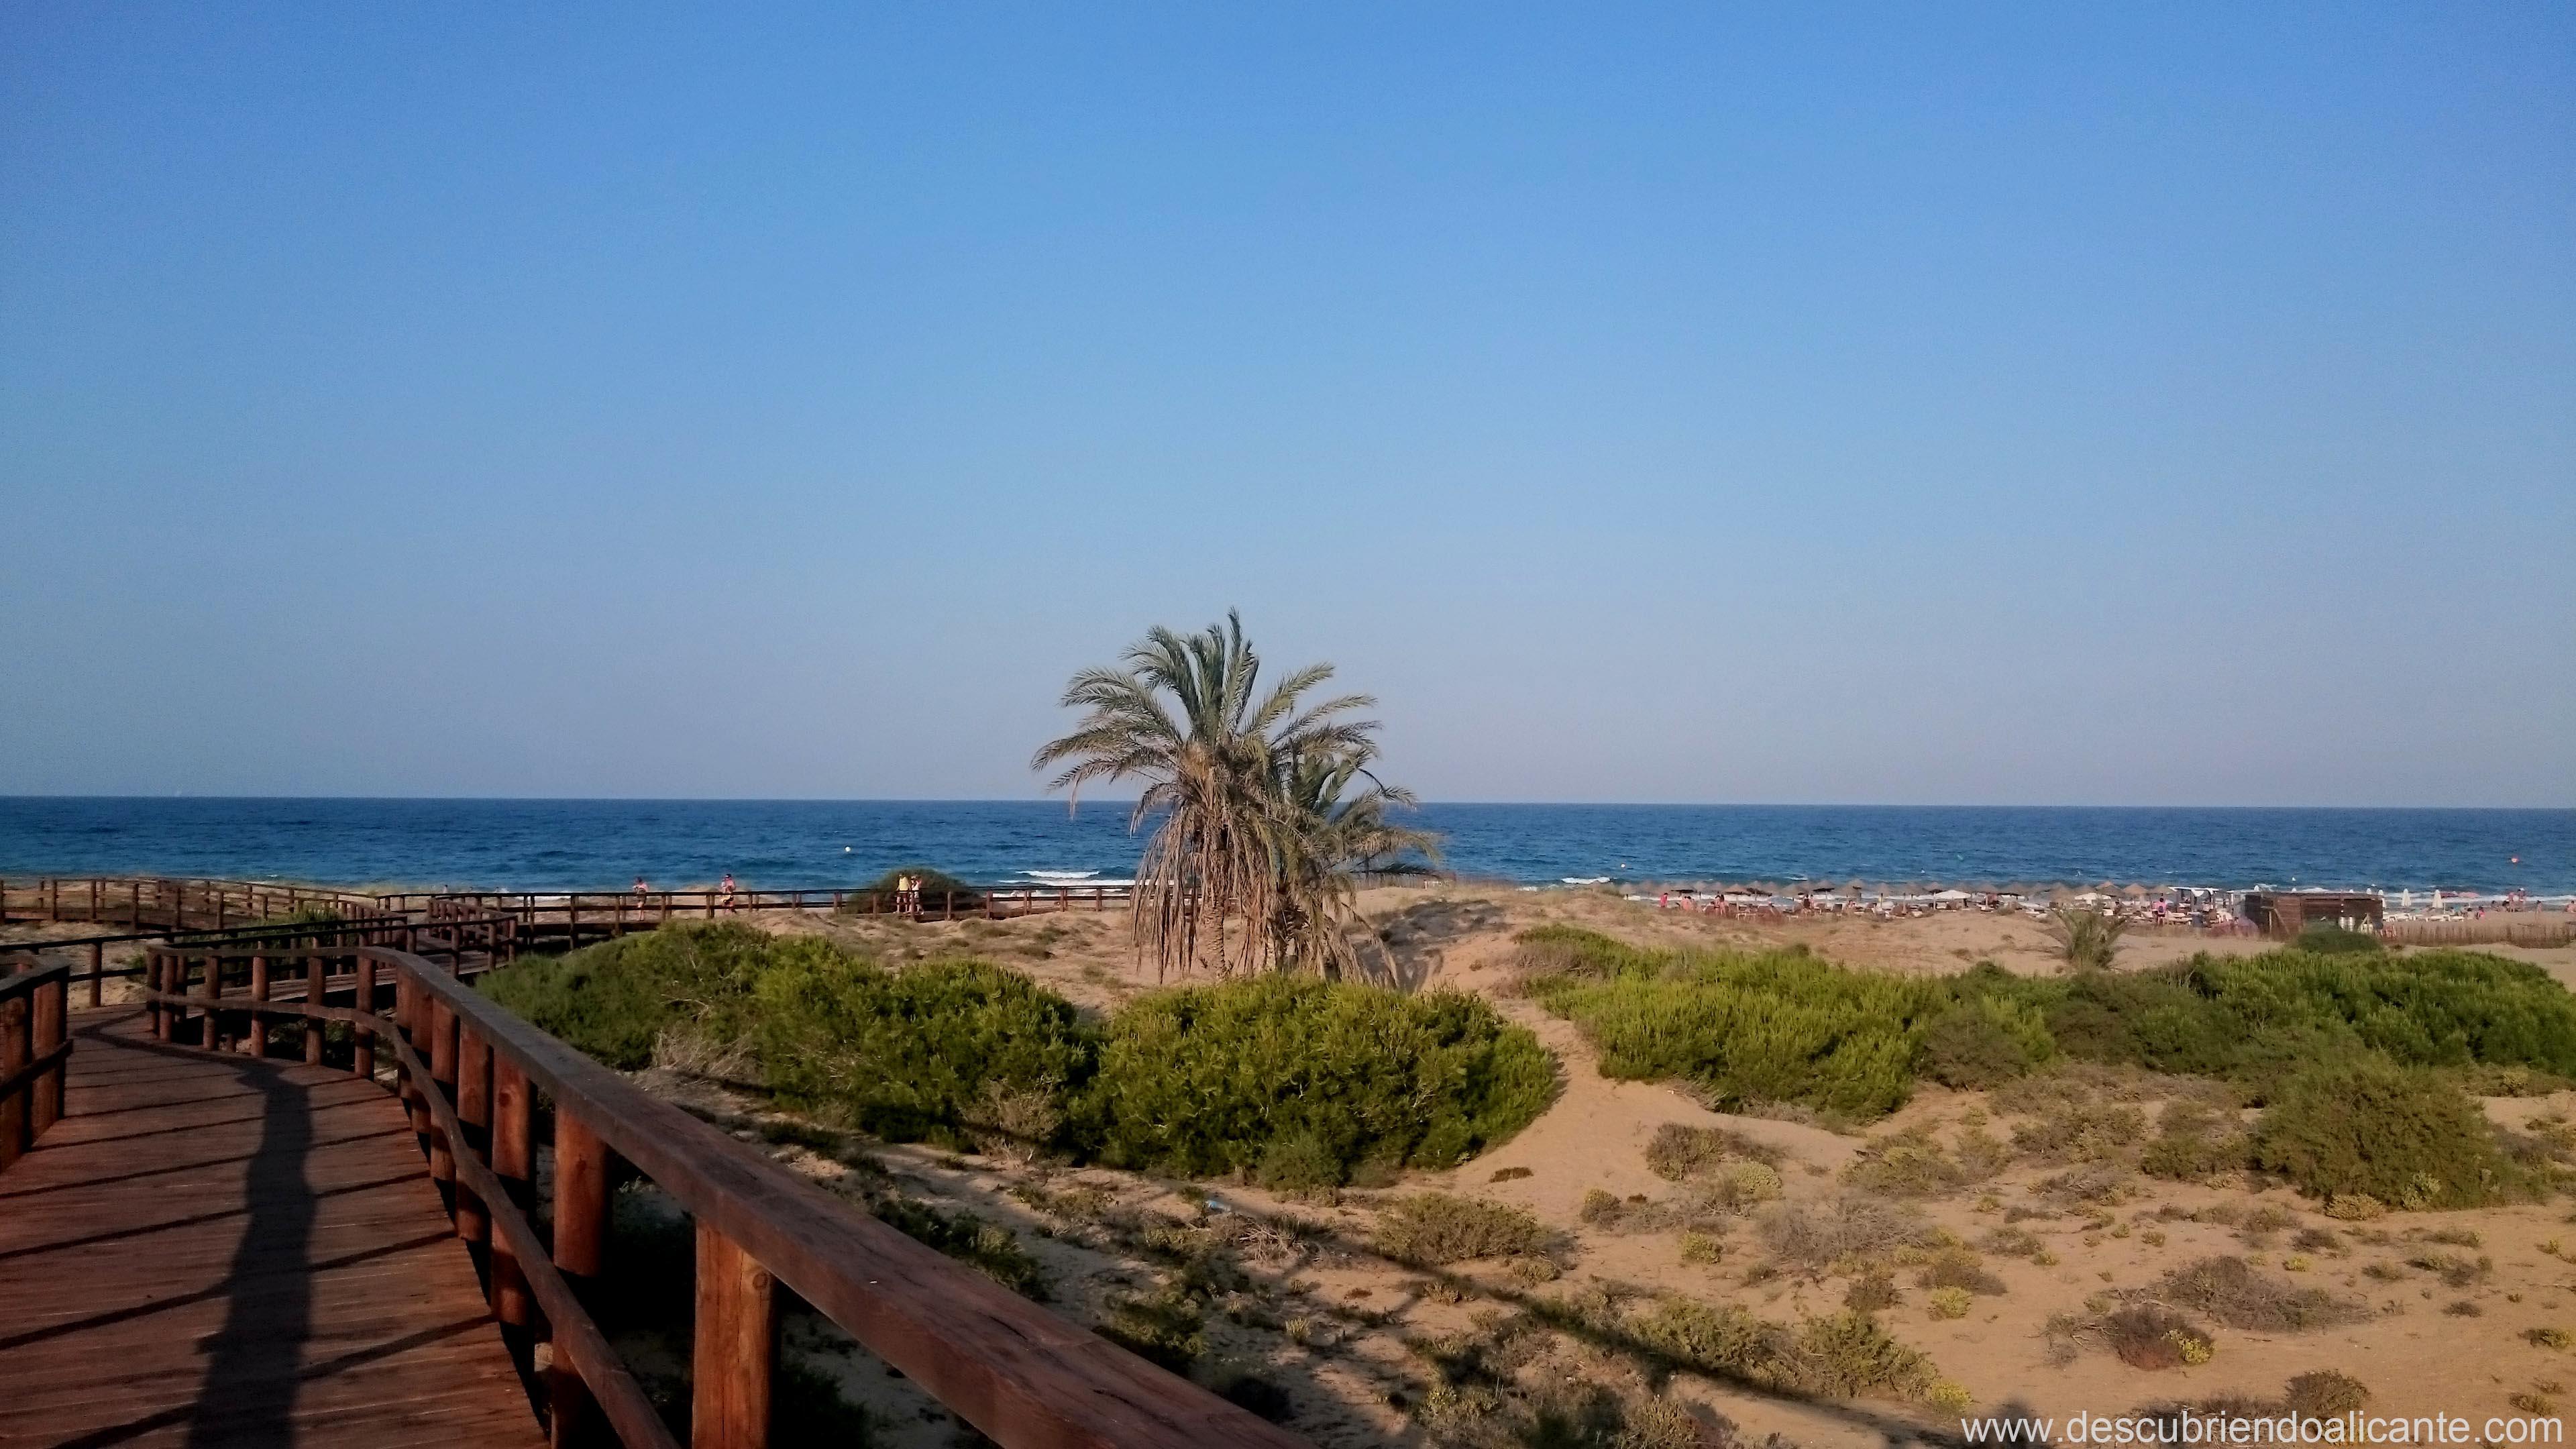 pasarela-de-madera-playa-arenales-elche-2